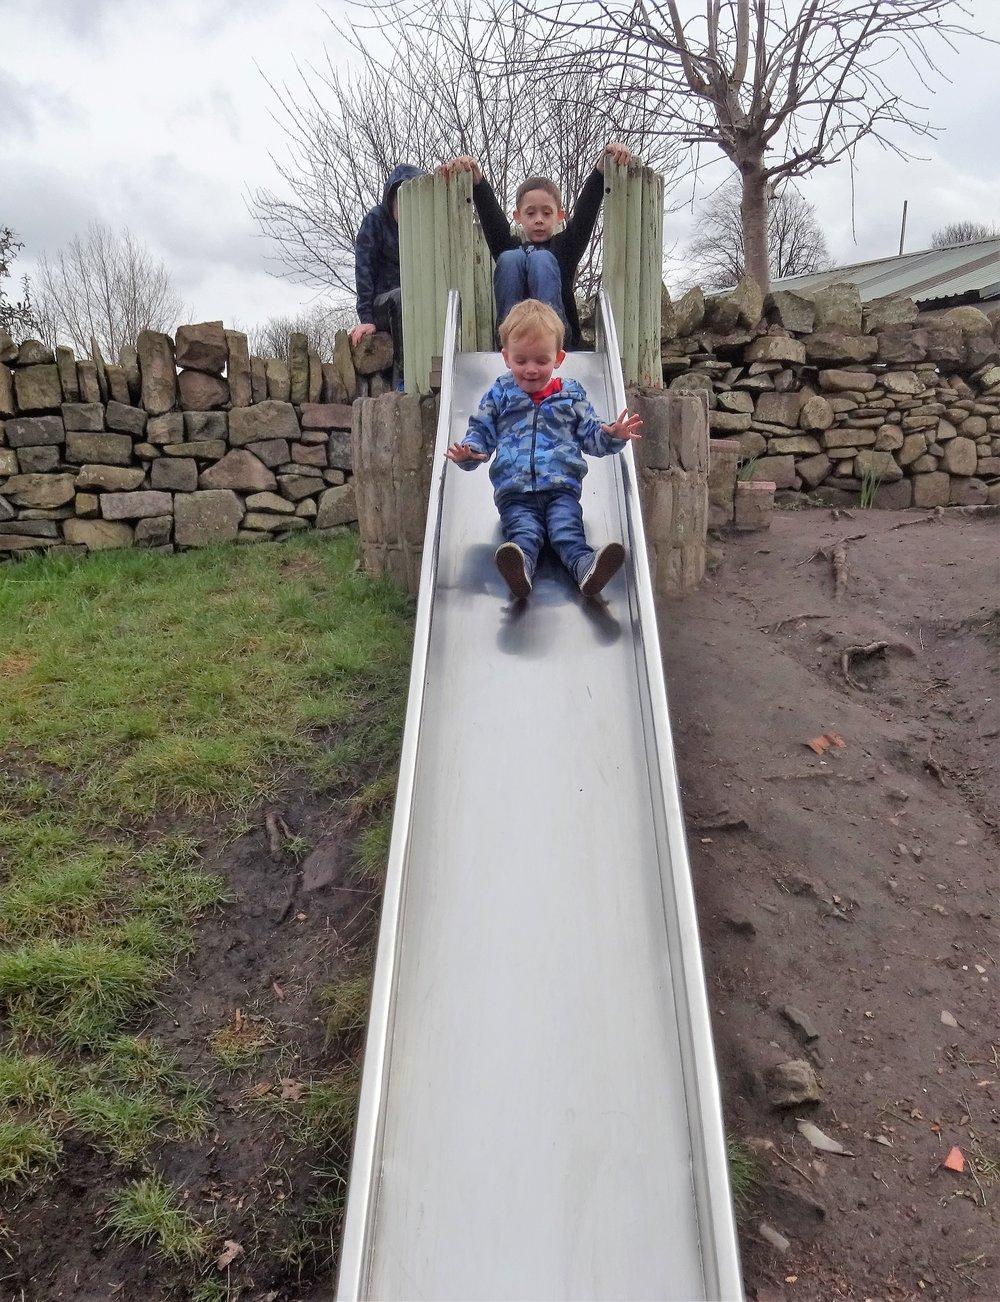 boy and slide.jpg